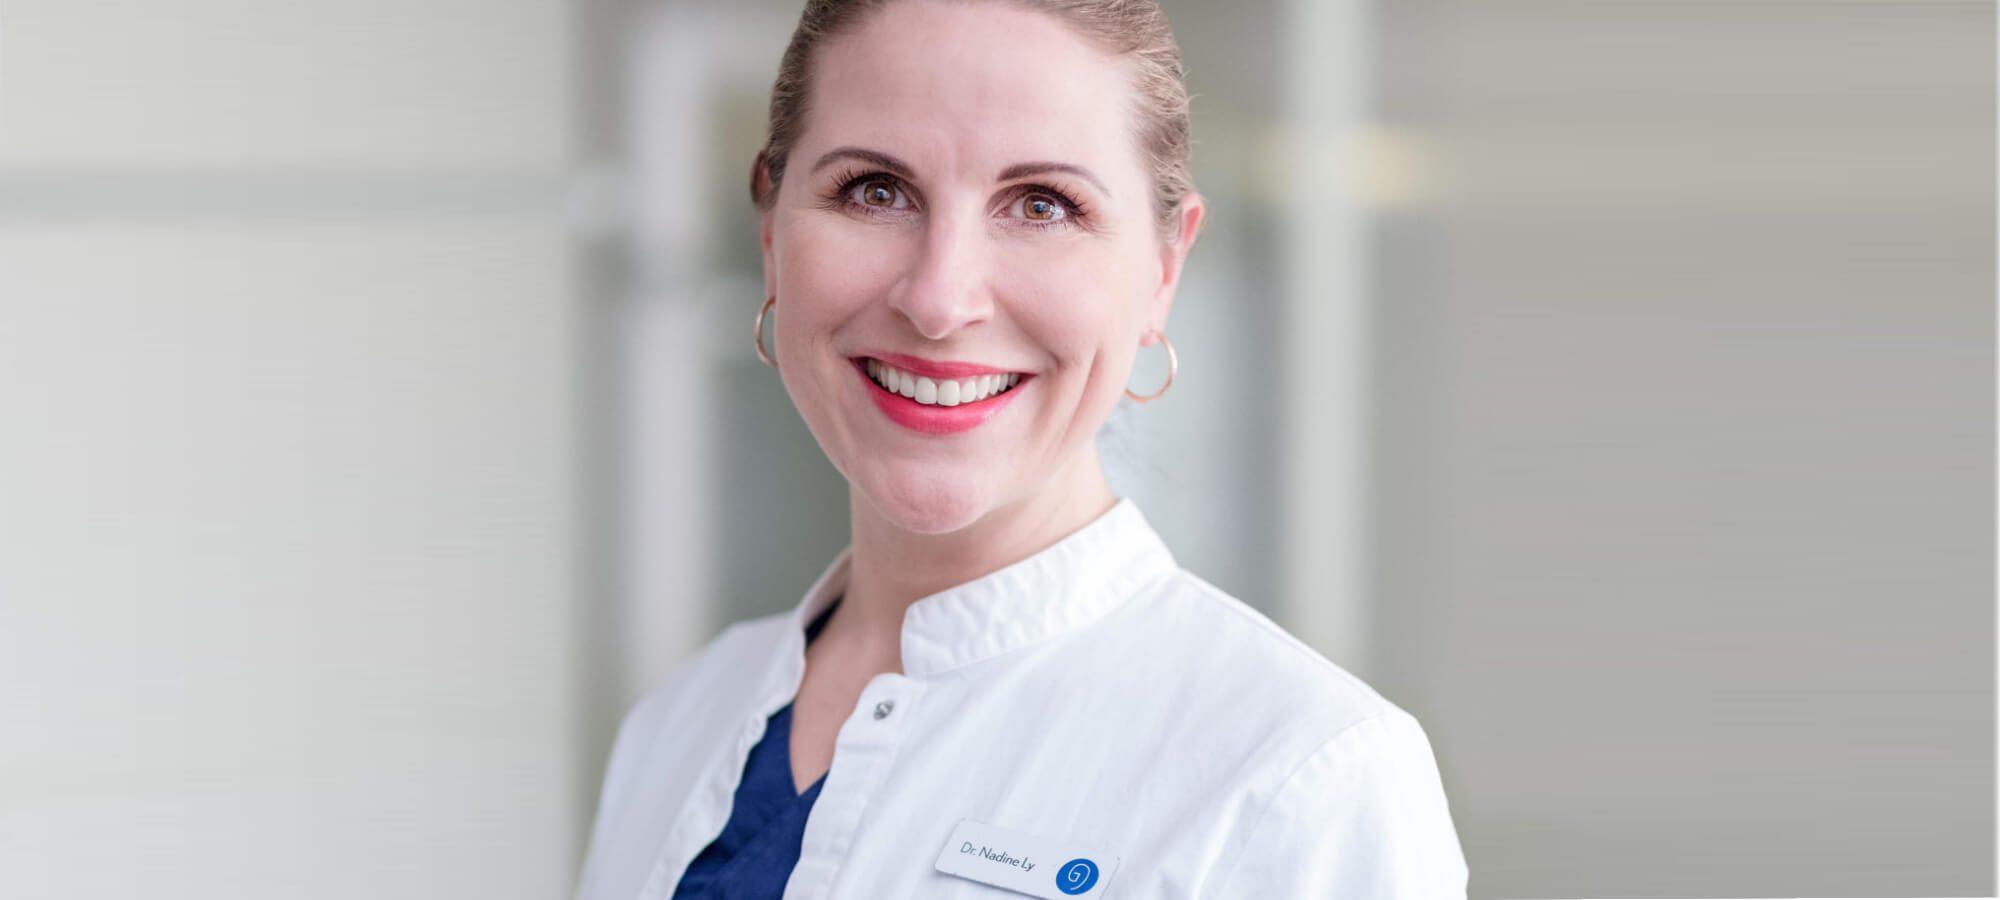 Zahnärztin Dr. med. Nadine Ly in Frankfurt | groisman & laube